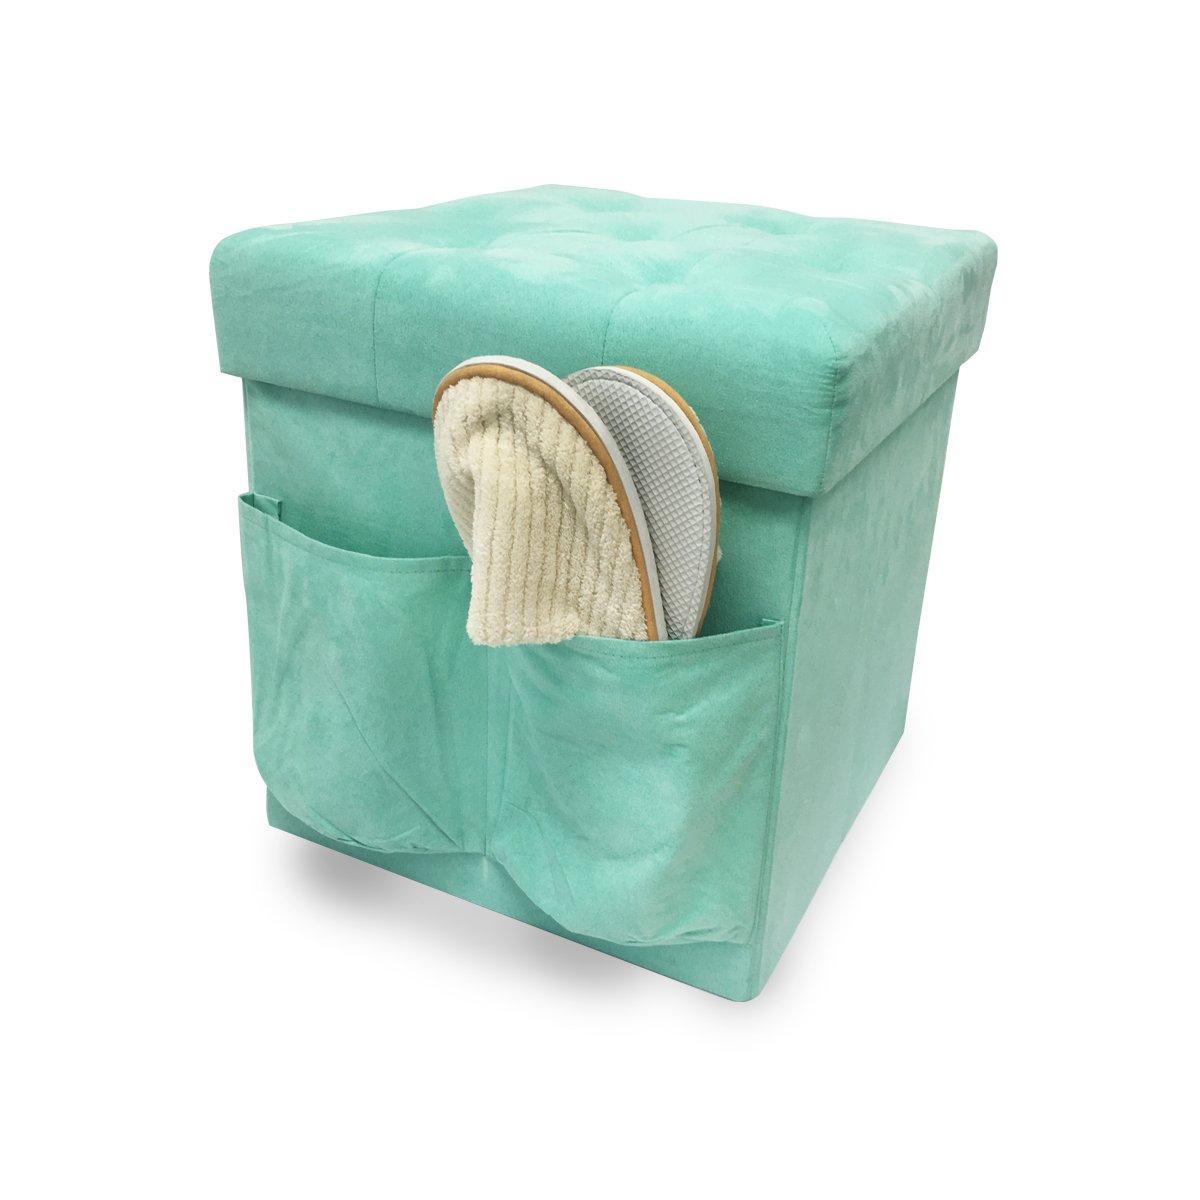 ZEYU HOME Faux Suede Storage Ottoman Cube Foldable Green